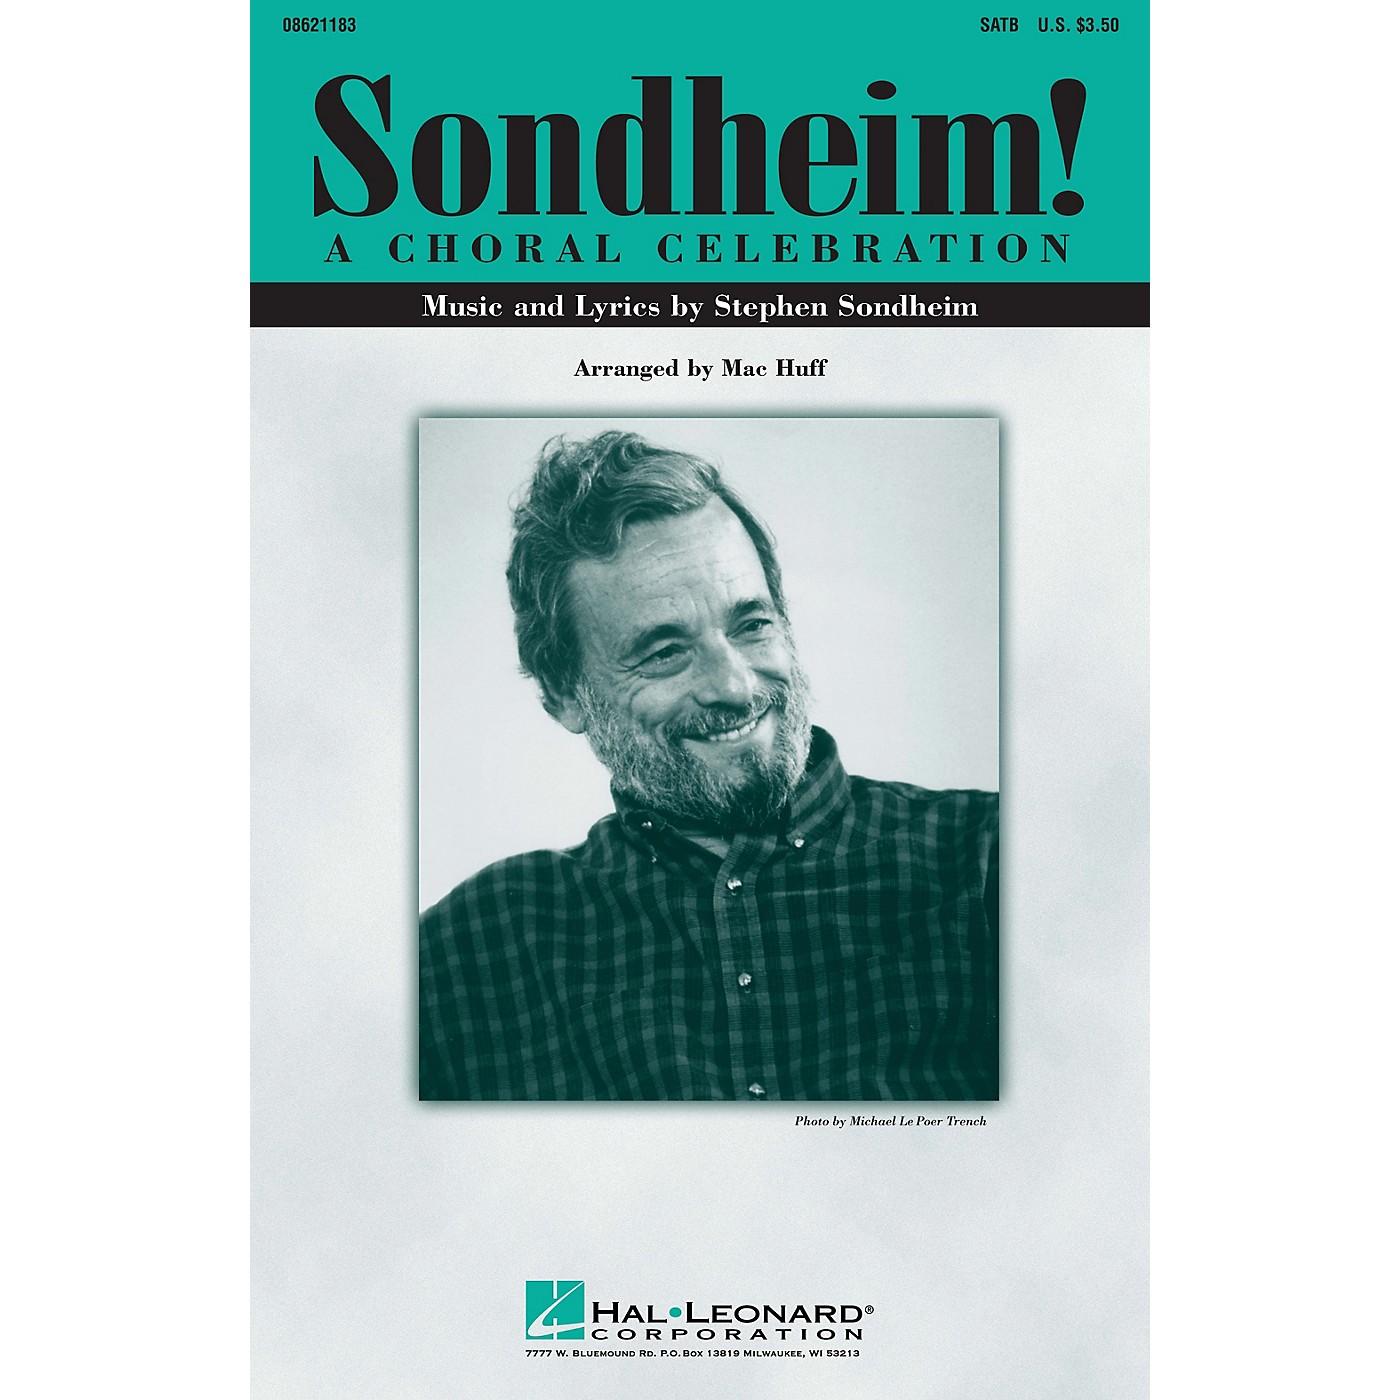 Hal Leonard Sondheim! A Choral Celebration (Medley) SATB arranged by Mac Huff thumbnail